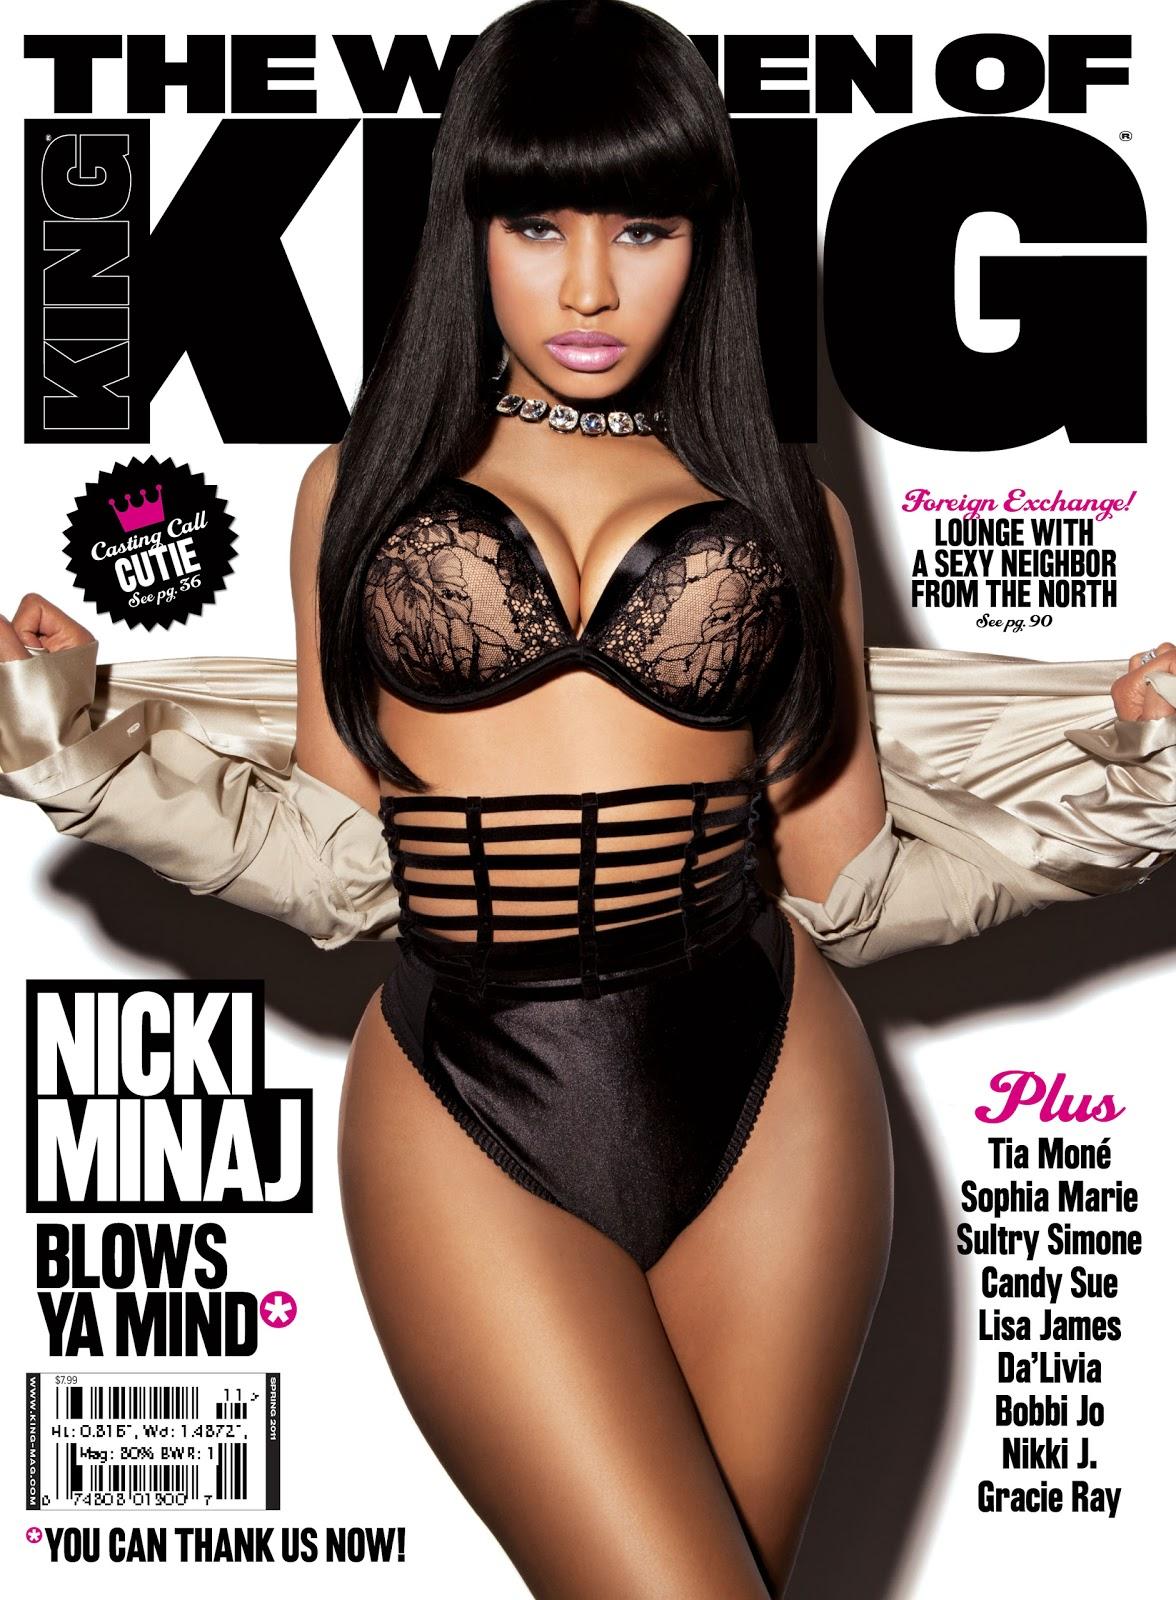 http://2.bp.blogspot.com/_8i7Bm0zG4LY/TRpSLVun9bI/AAAAAAAAEPQ/TMBgoXmEO4o/s1600/nicki-minaj-king-magazine.jpg